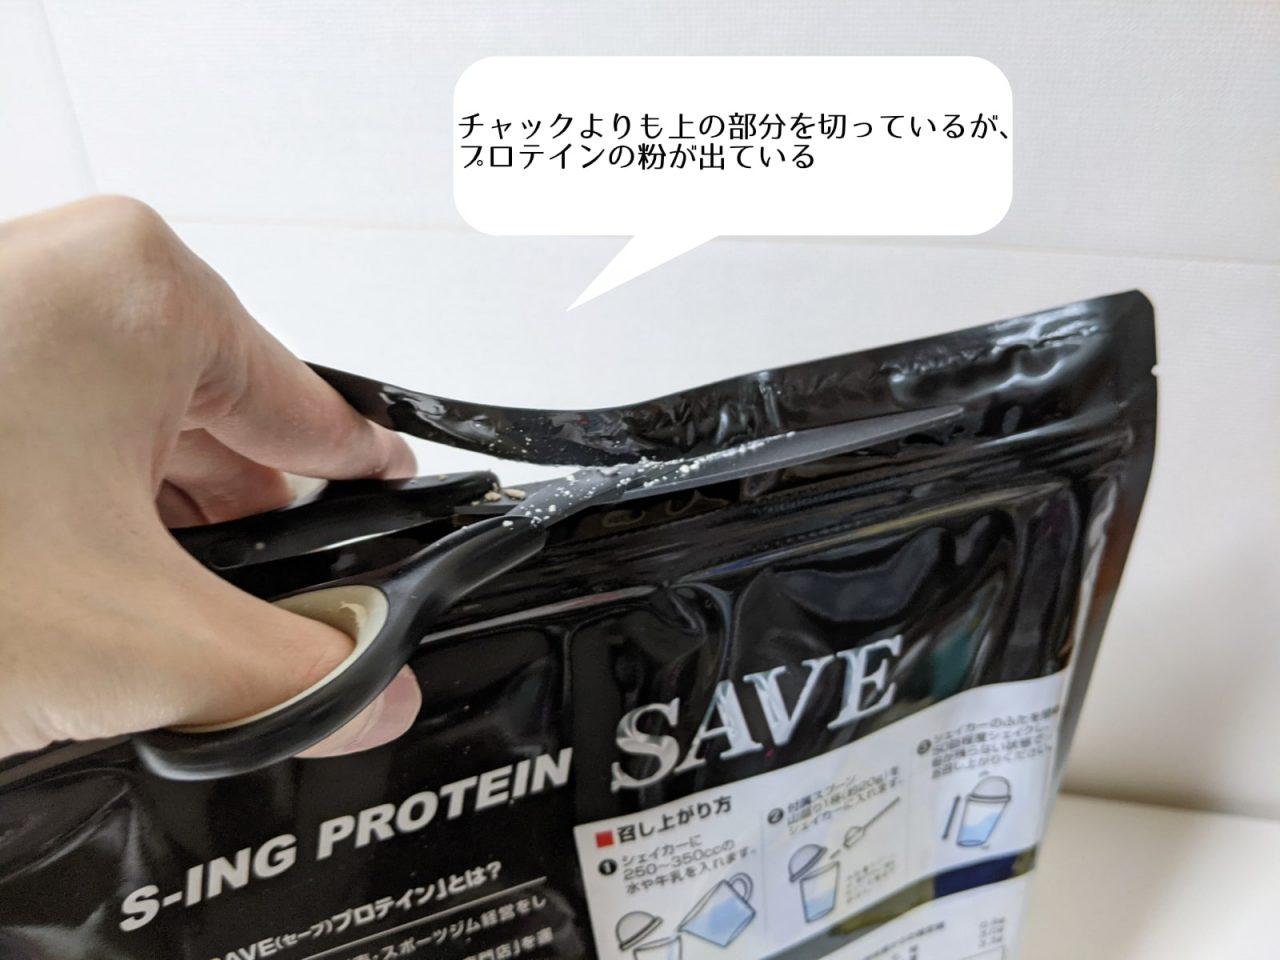 S-ING_ProteinSaveSuperPrice03